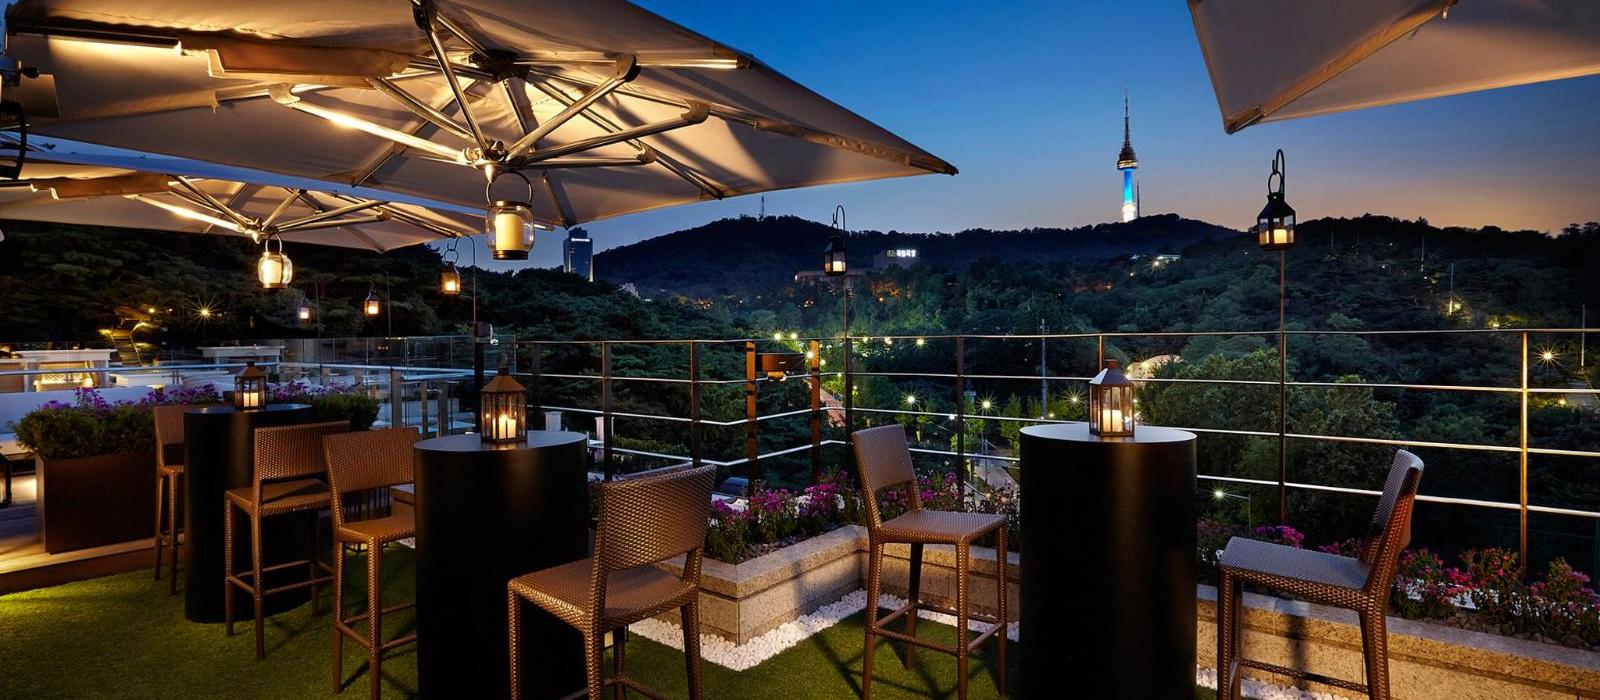 首尔新罗酒店(The Shilla Seoul) 屋顶花园图片  www.lhw.cn